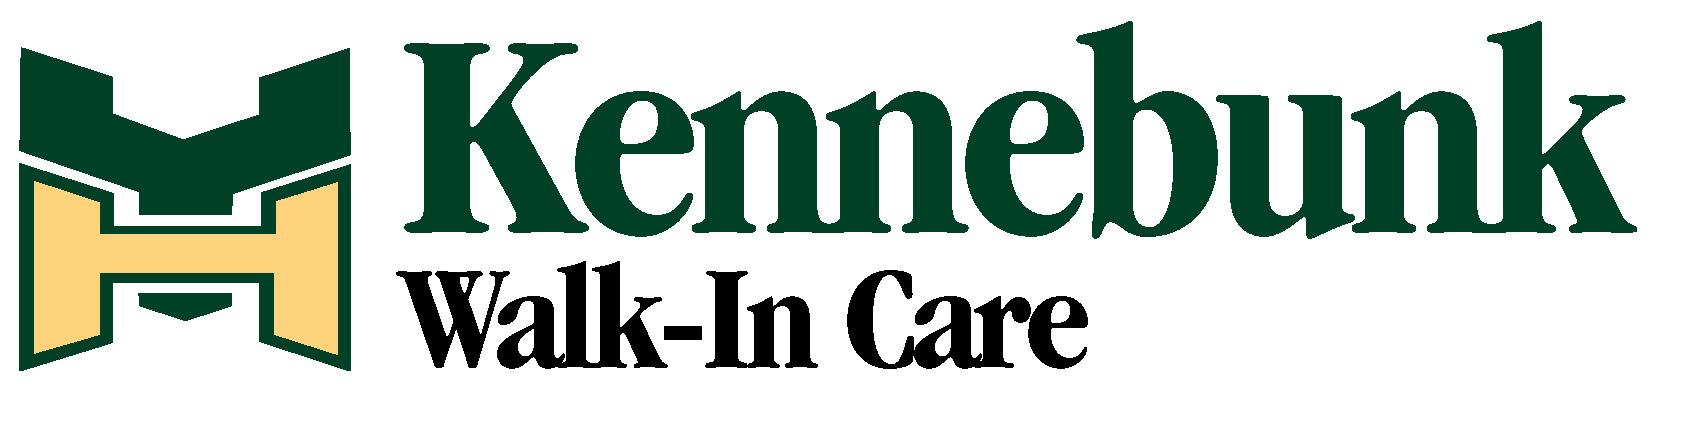 Waik in care kennebunk 2